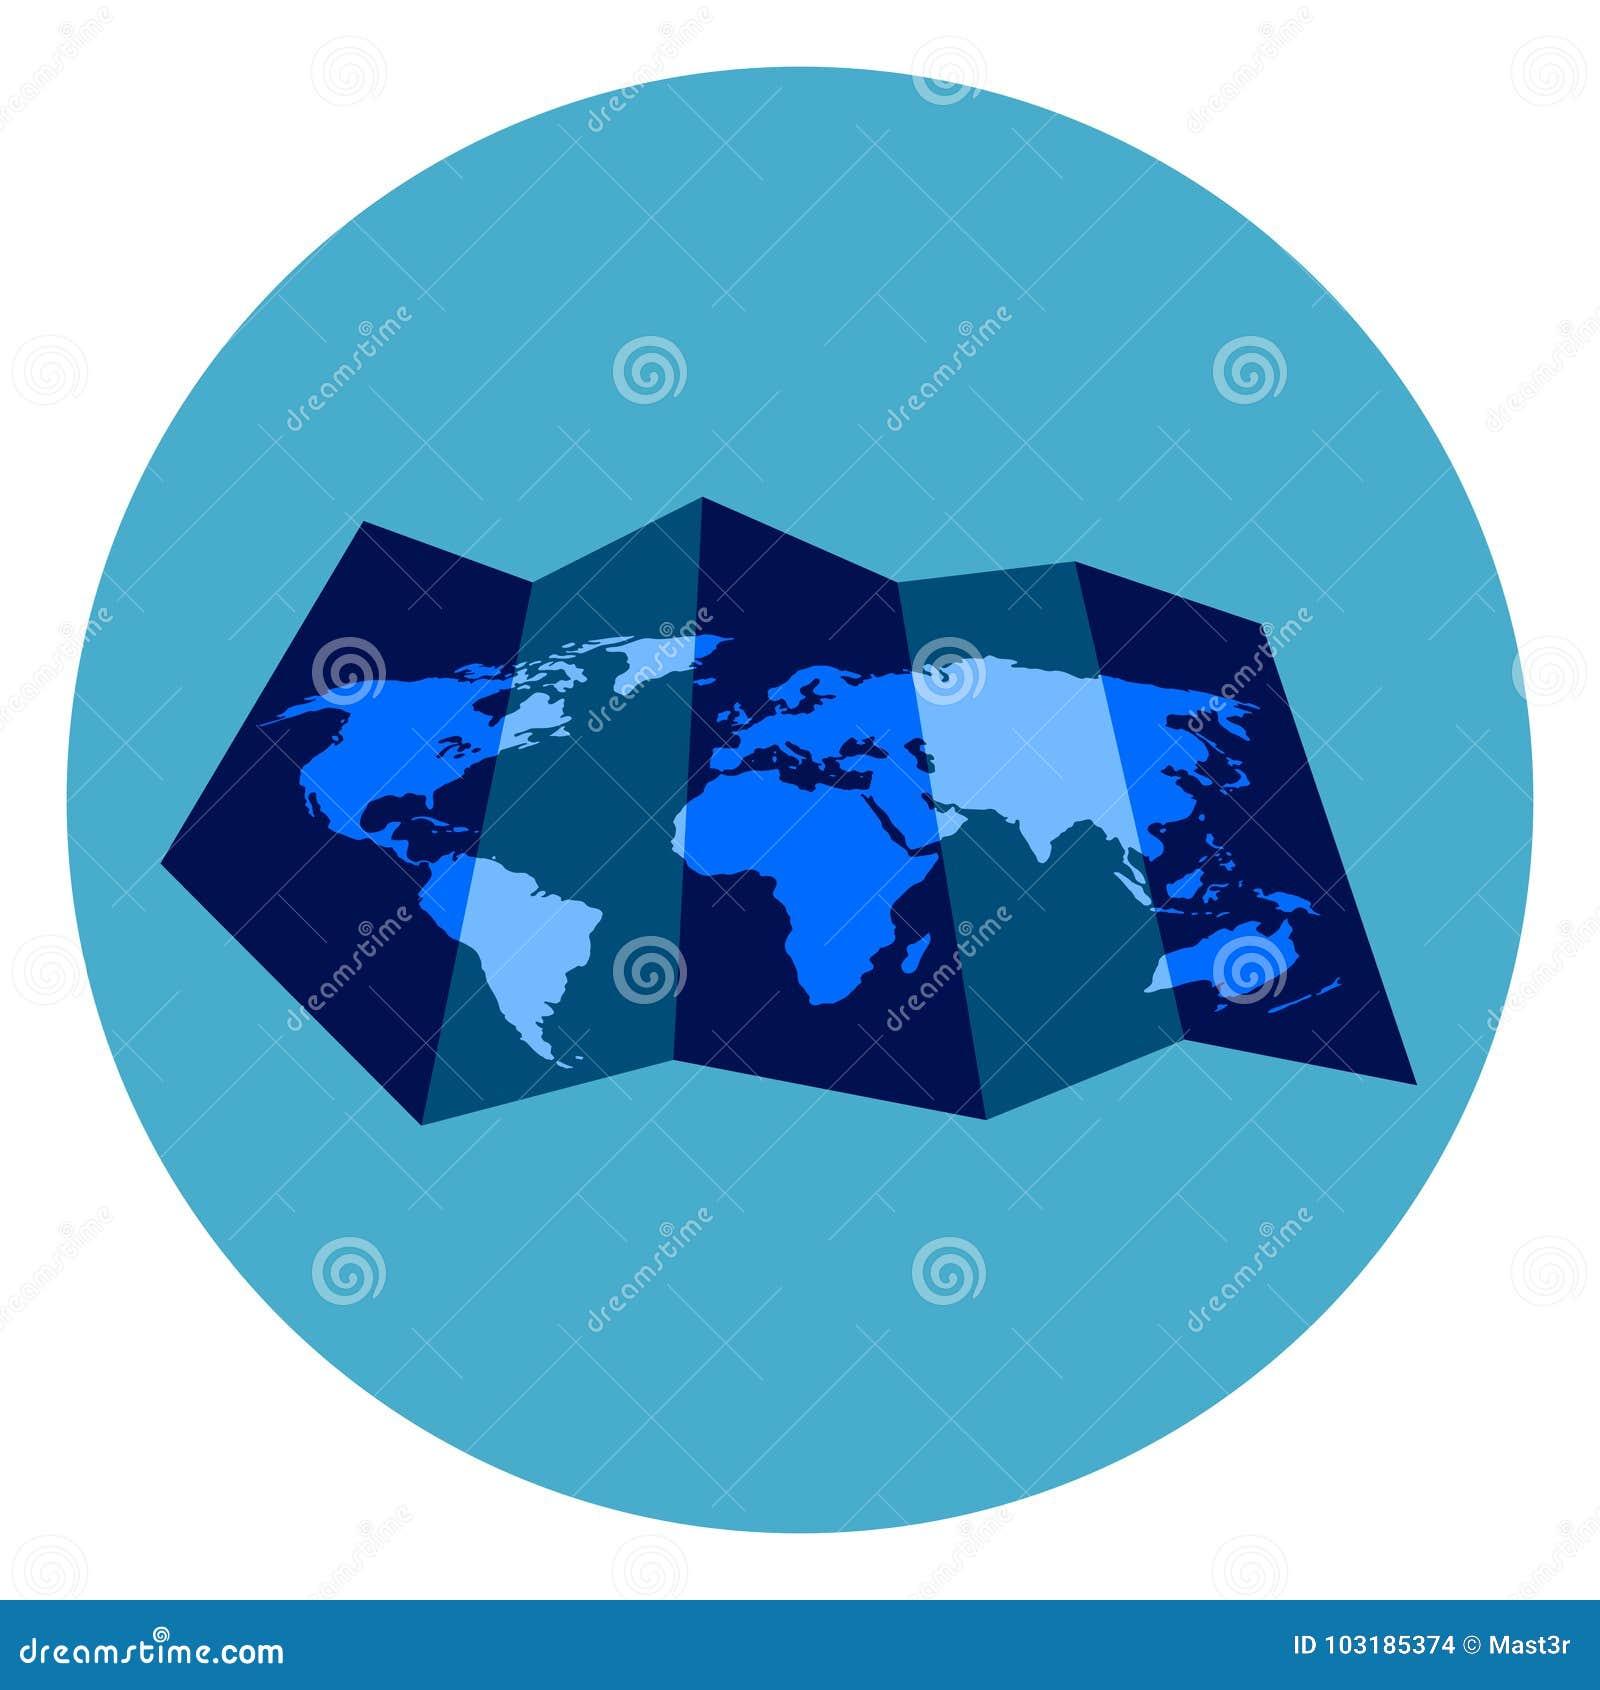 Round Globe Map.World Map Icon On Round Blue Background Stock Vector Illustration